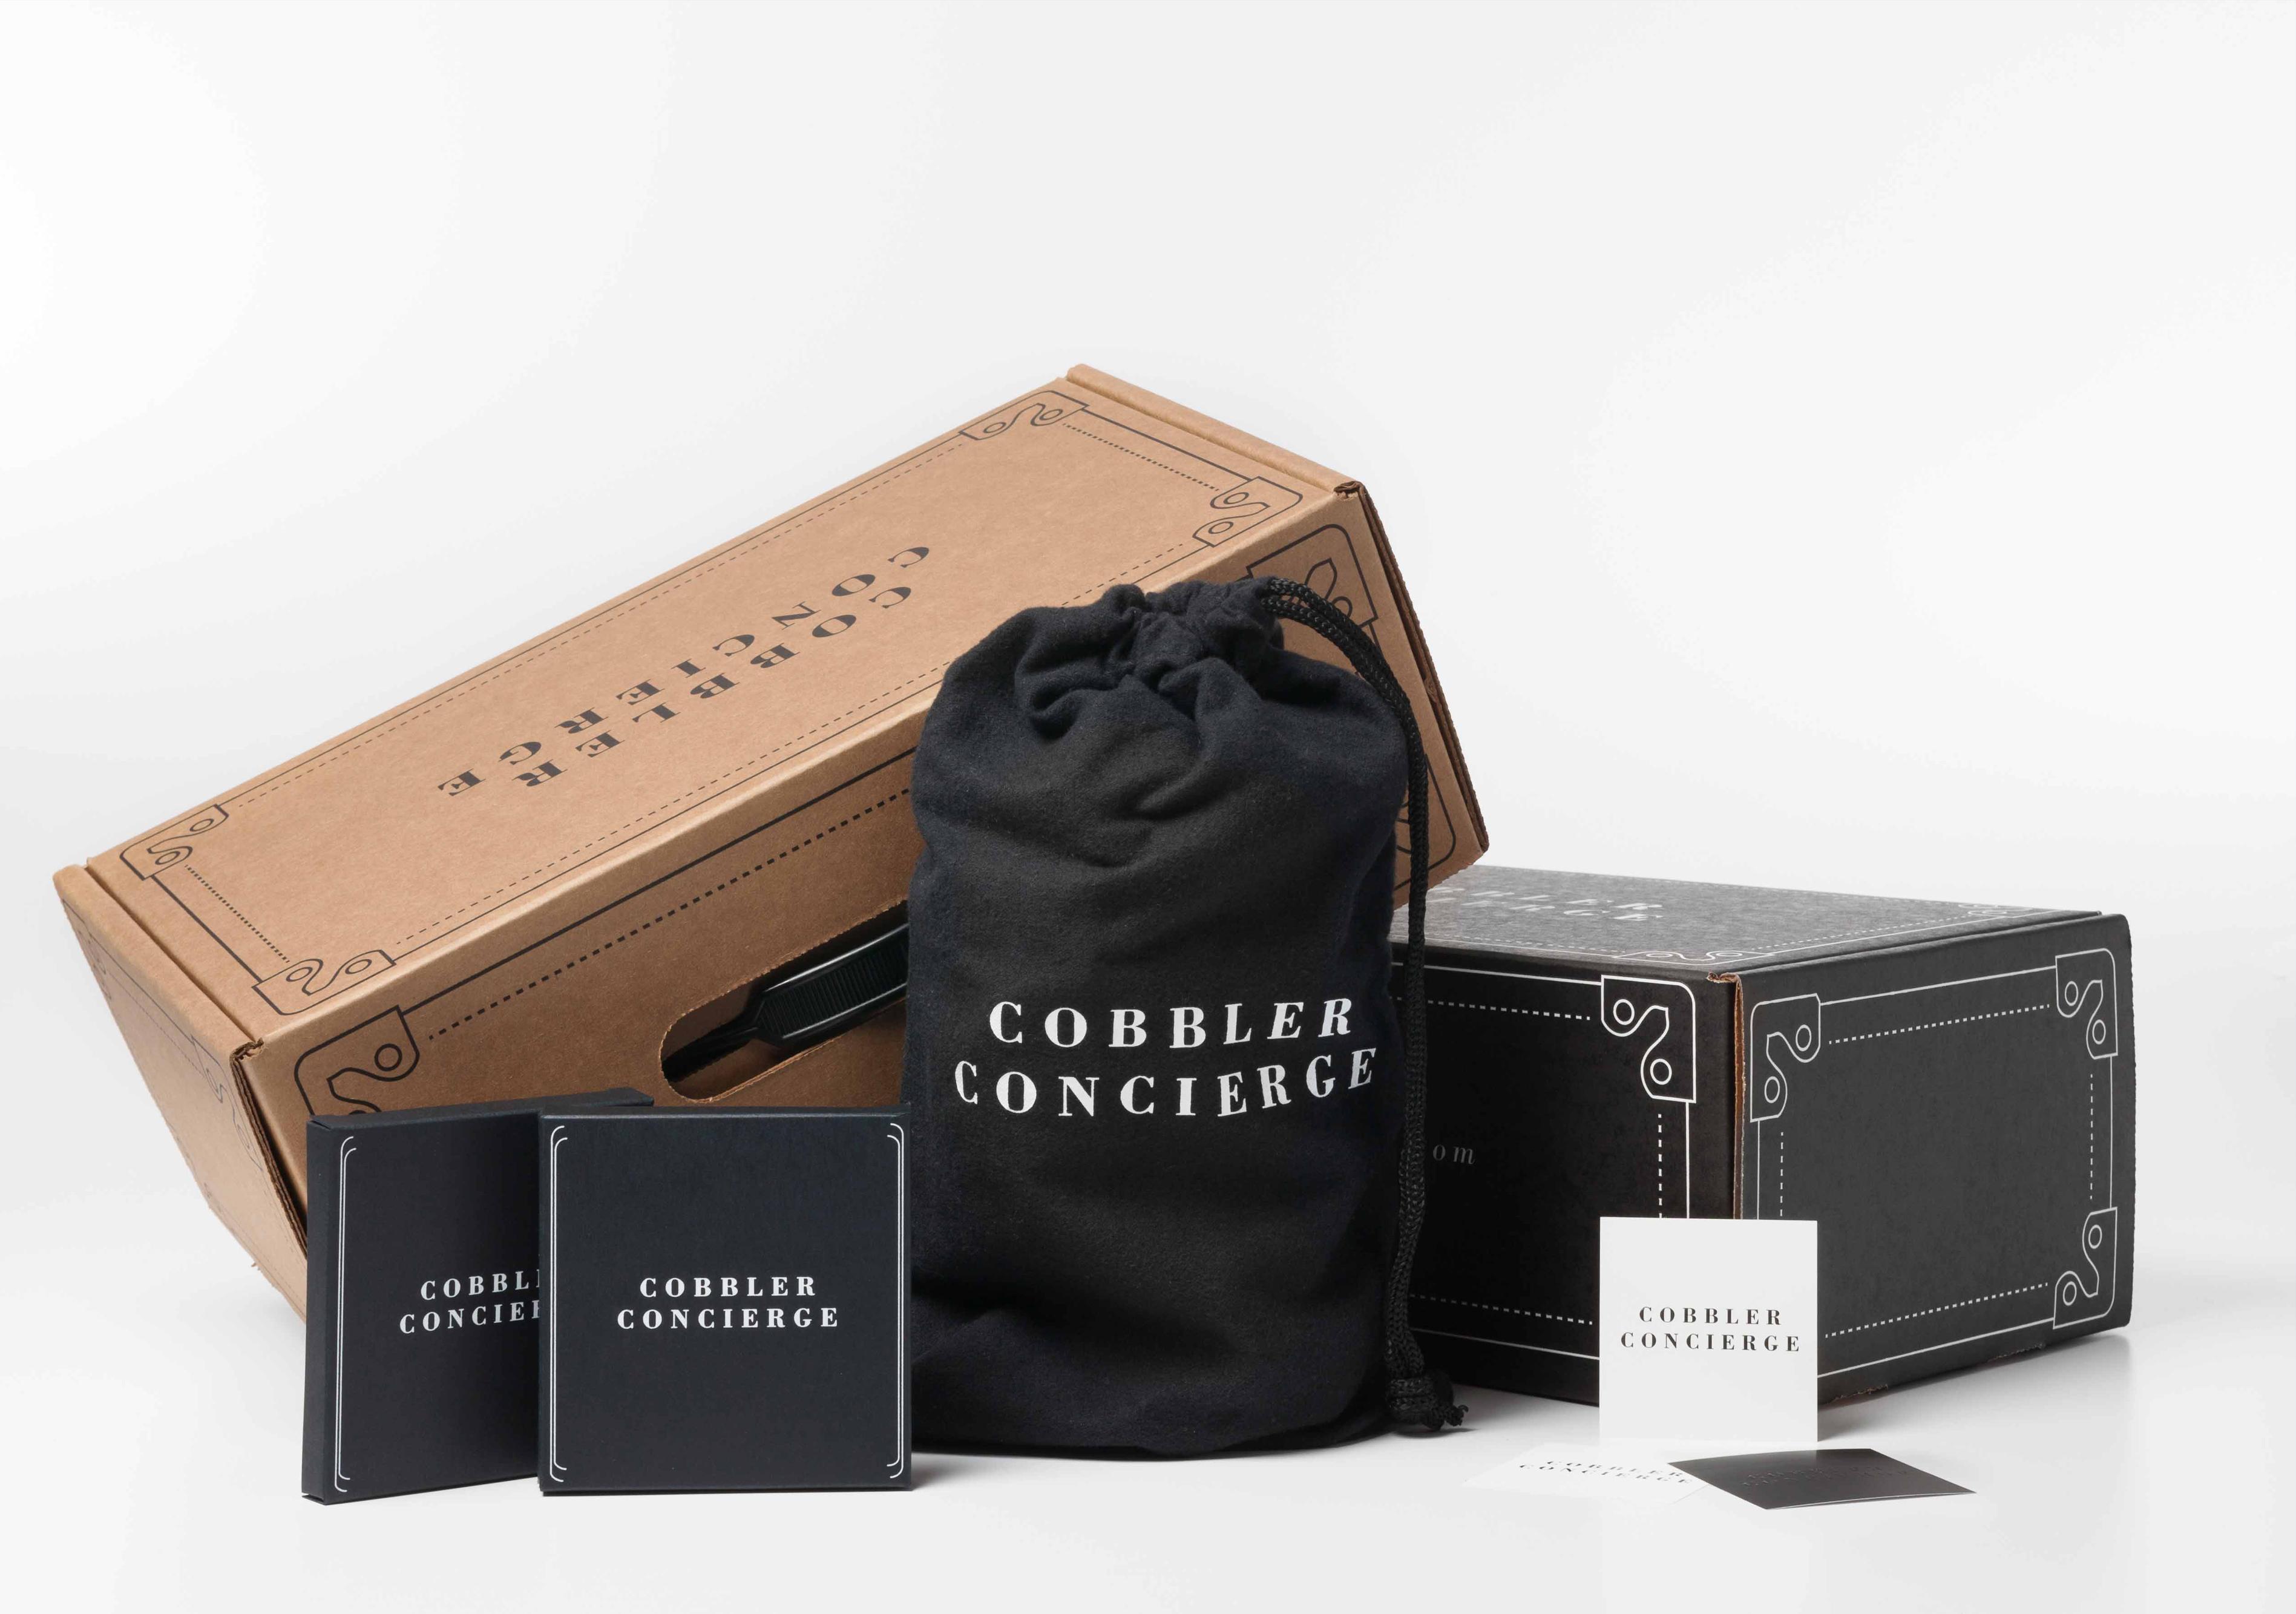 Cobbler Concierge in the Press